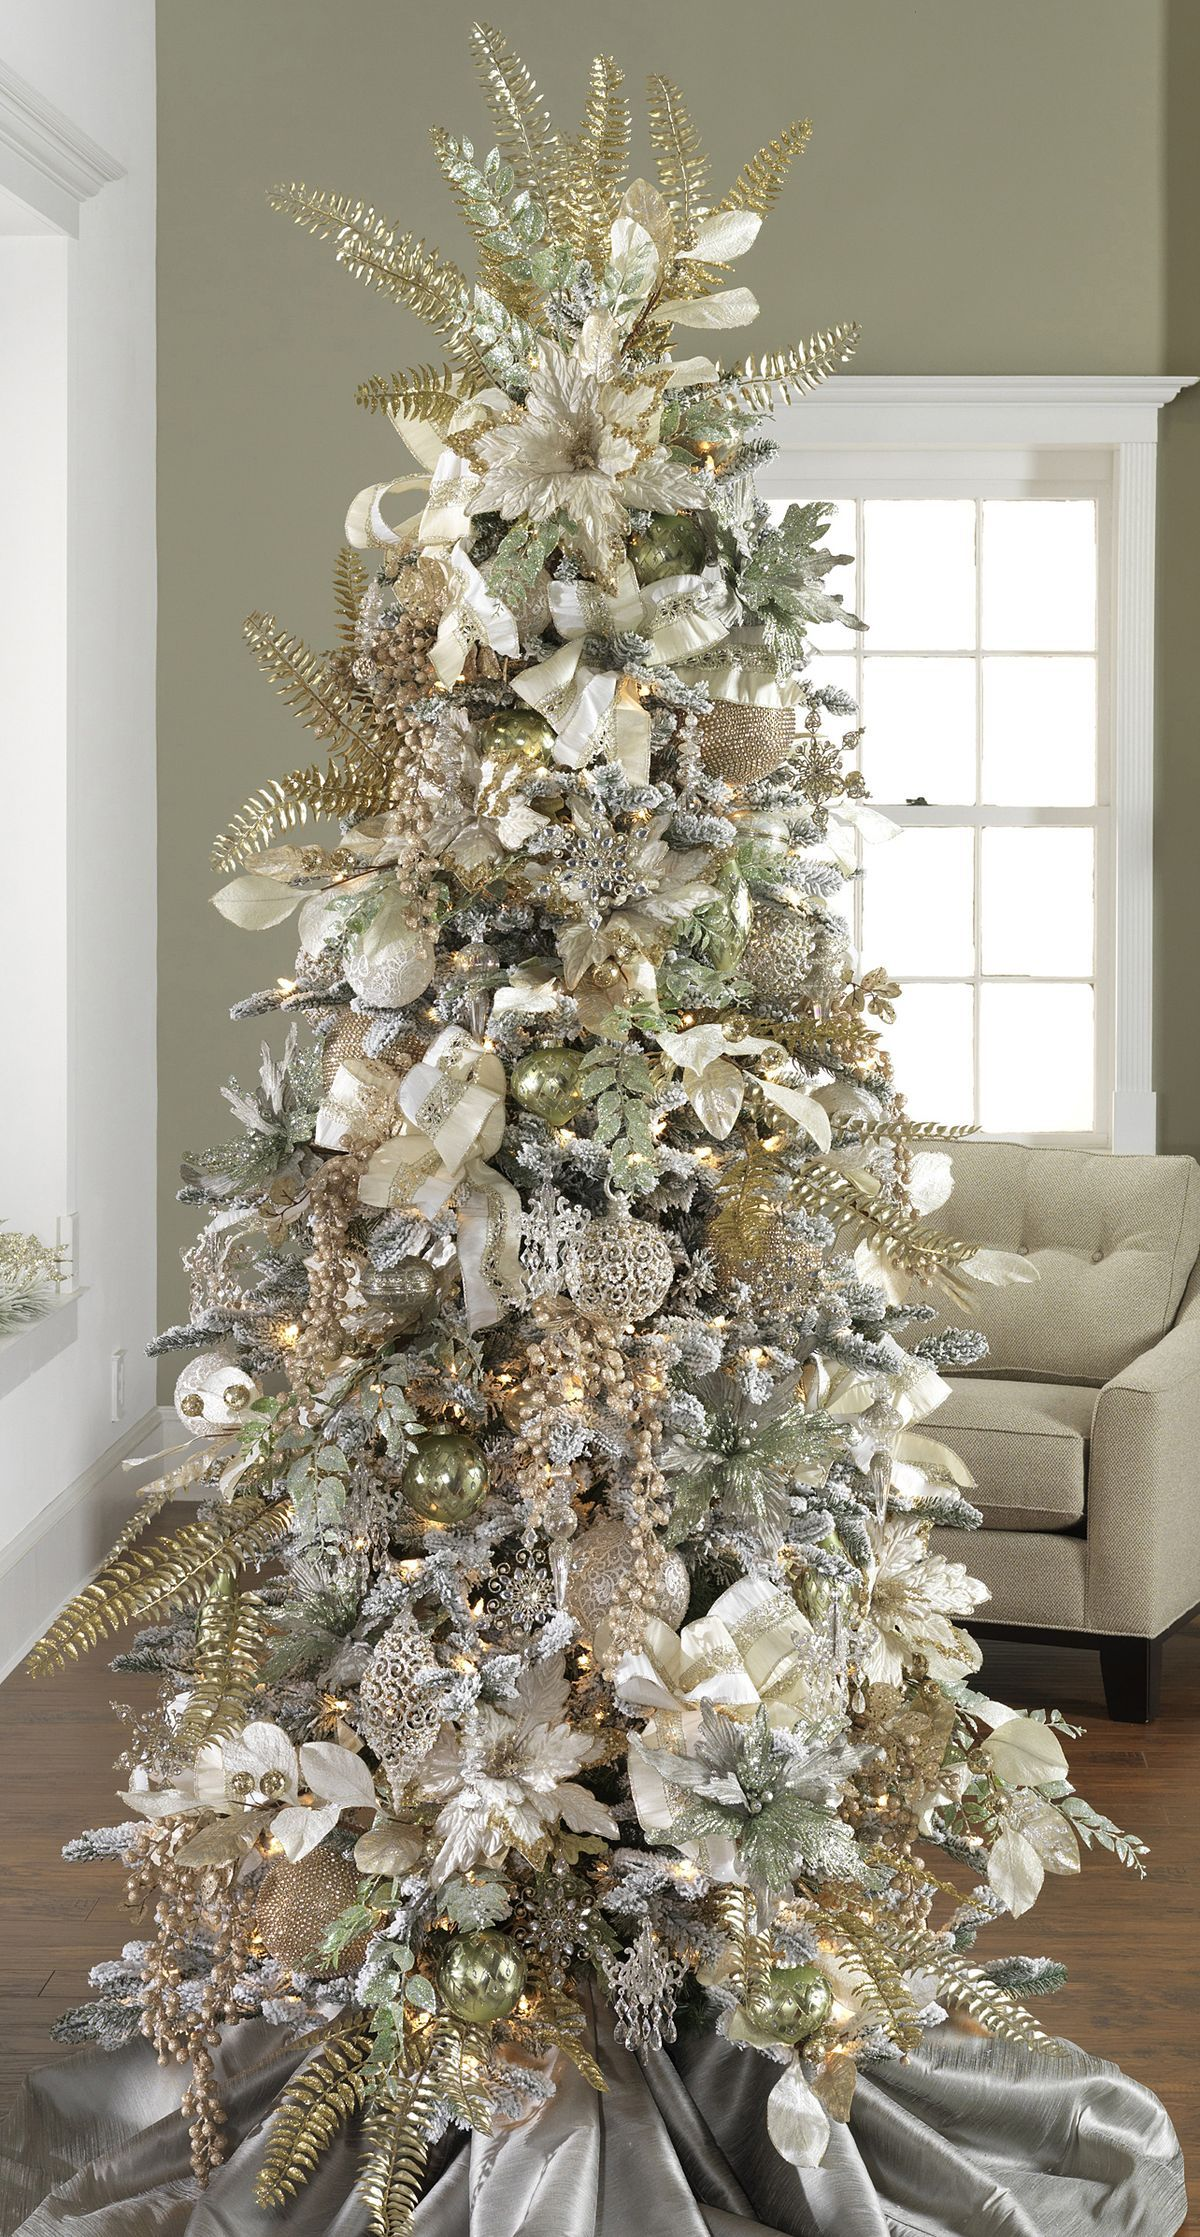 9f74d16f0f0ac4e55e3fddaa56619935jpg 12002237 pixels Christmas